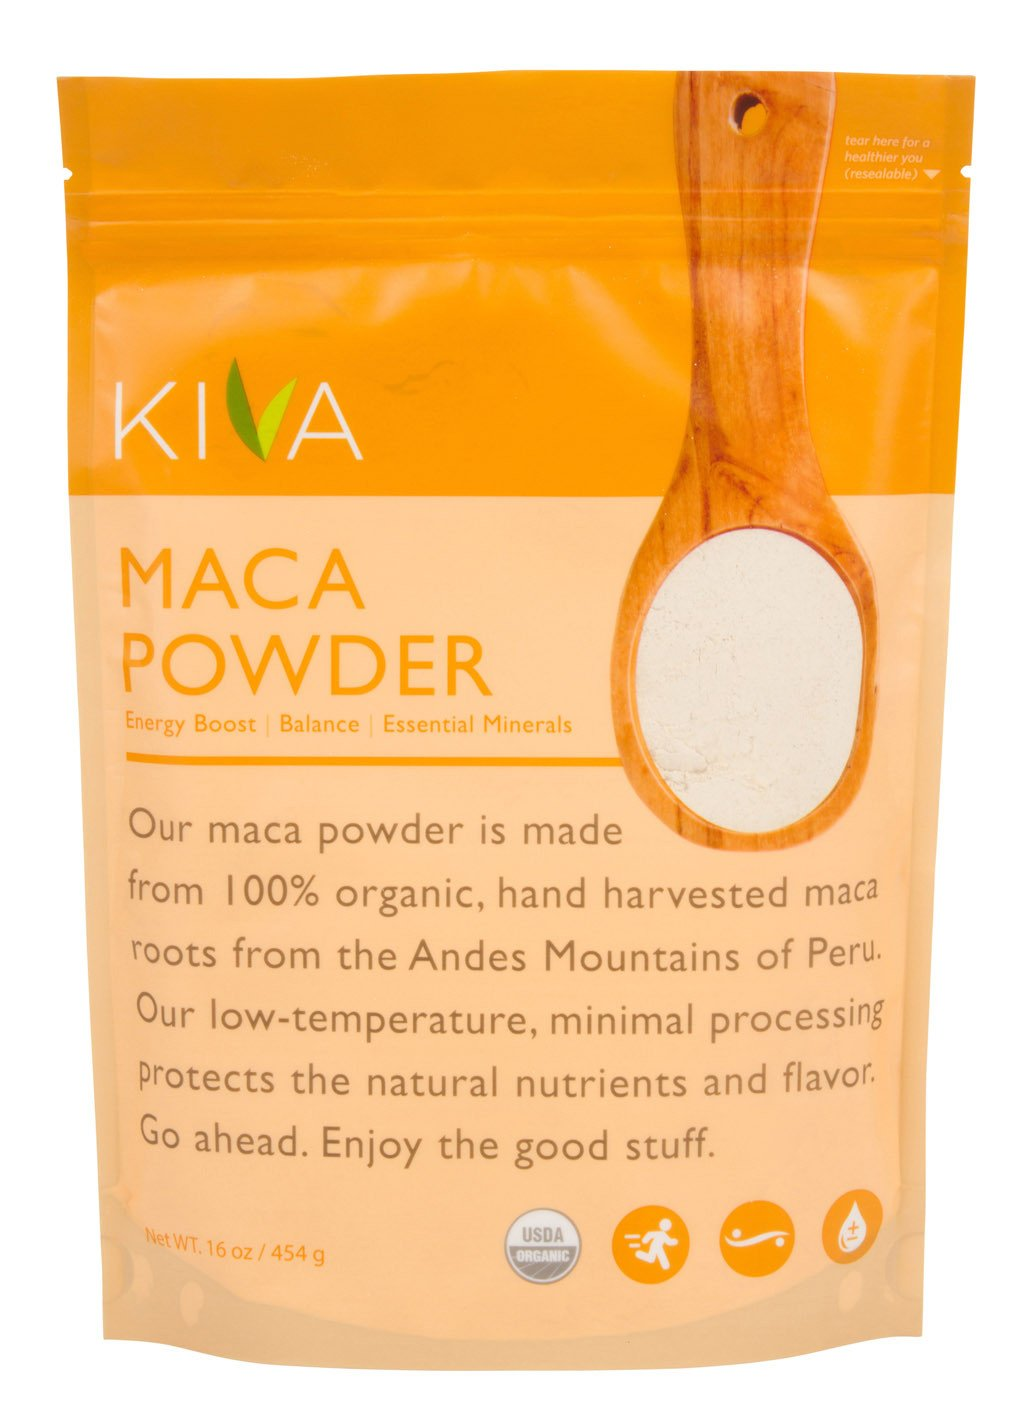 Kiva Organic Maca Powder- RAW and Non-GMO - LARGE 1 POUND BAG